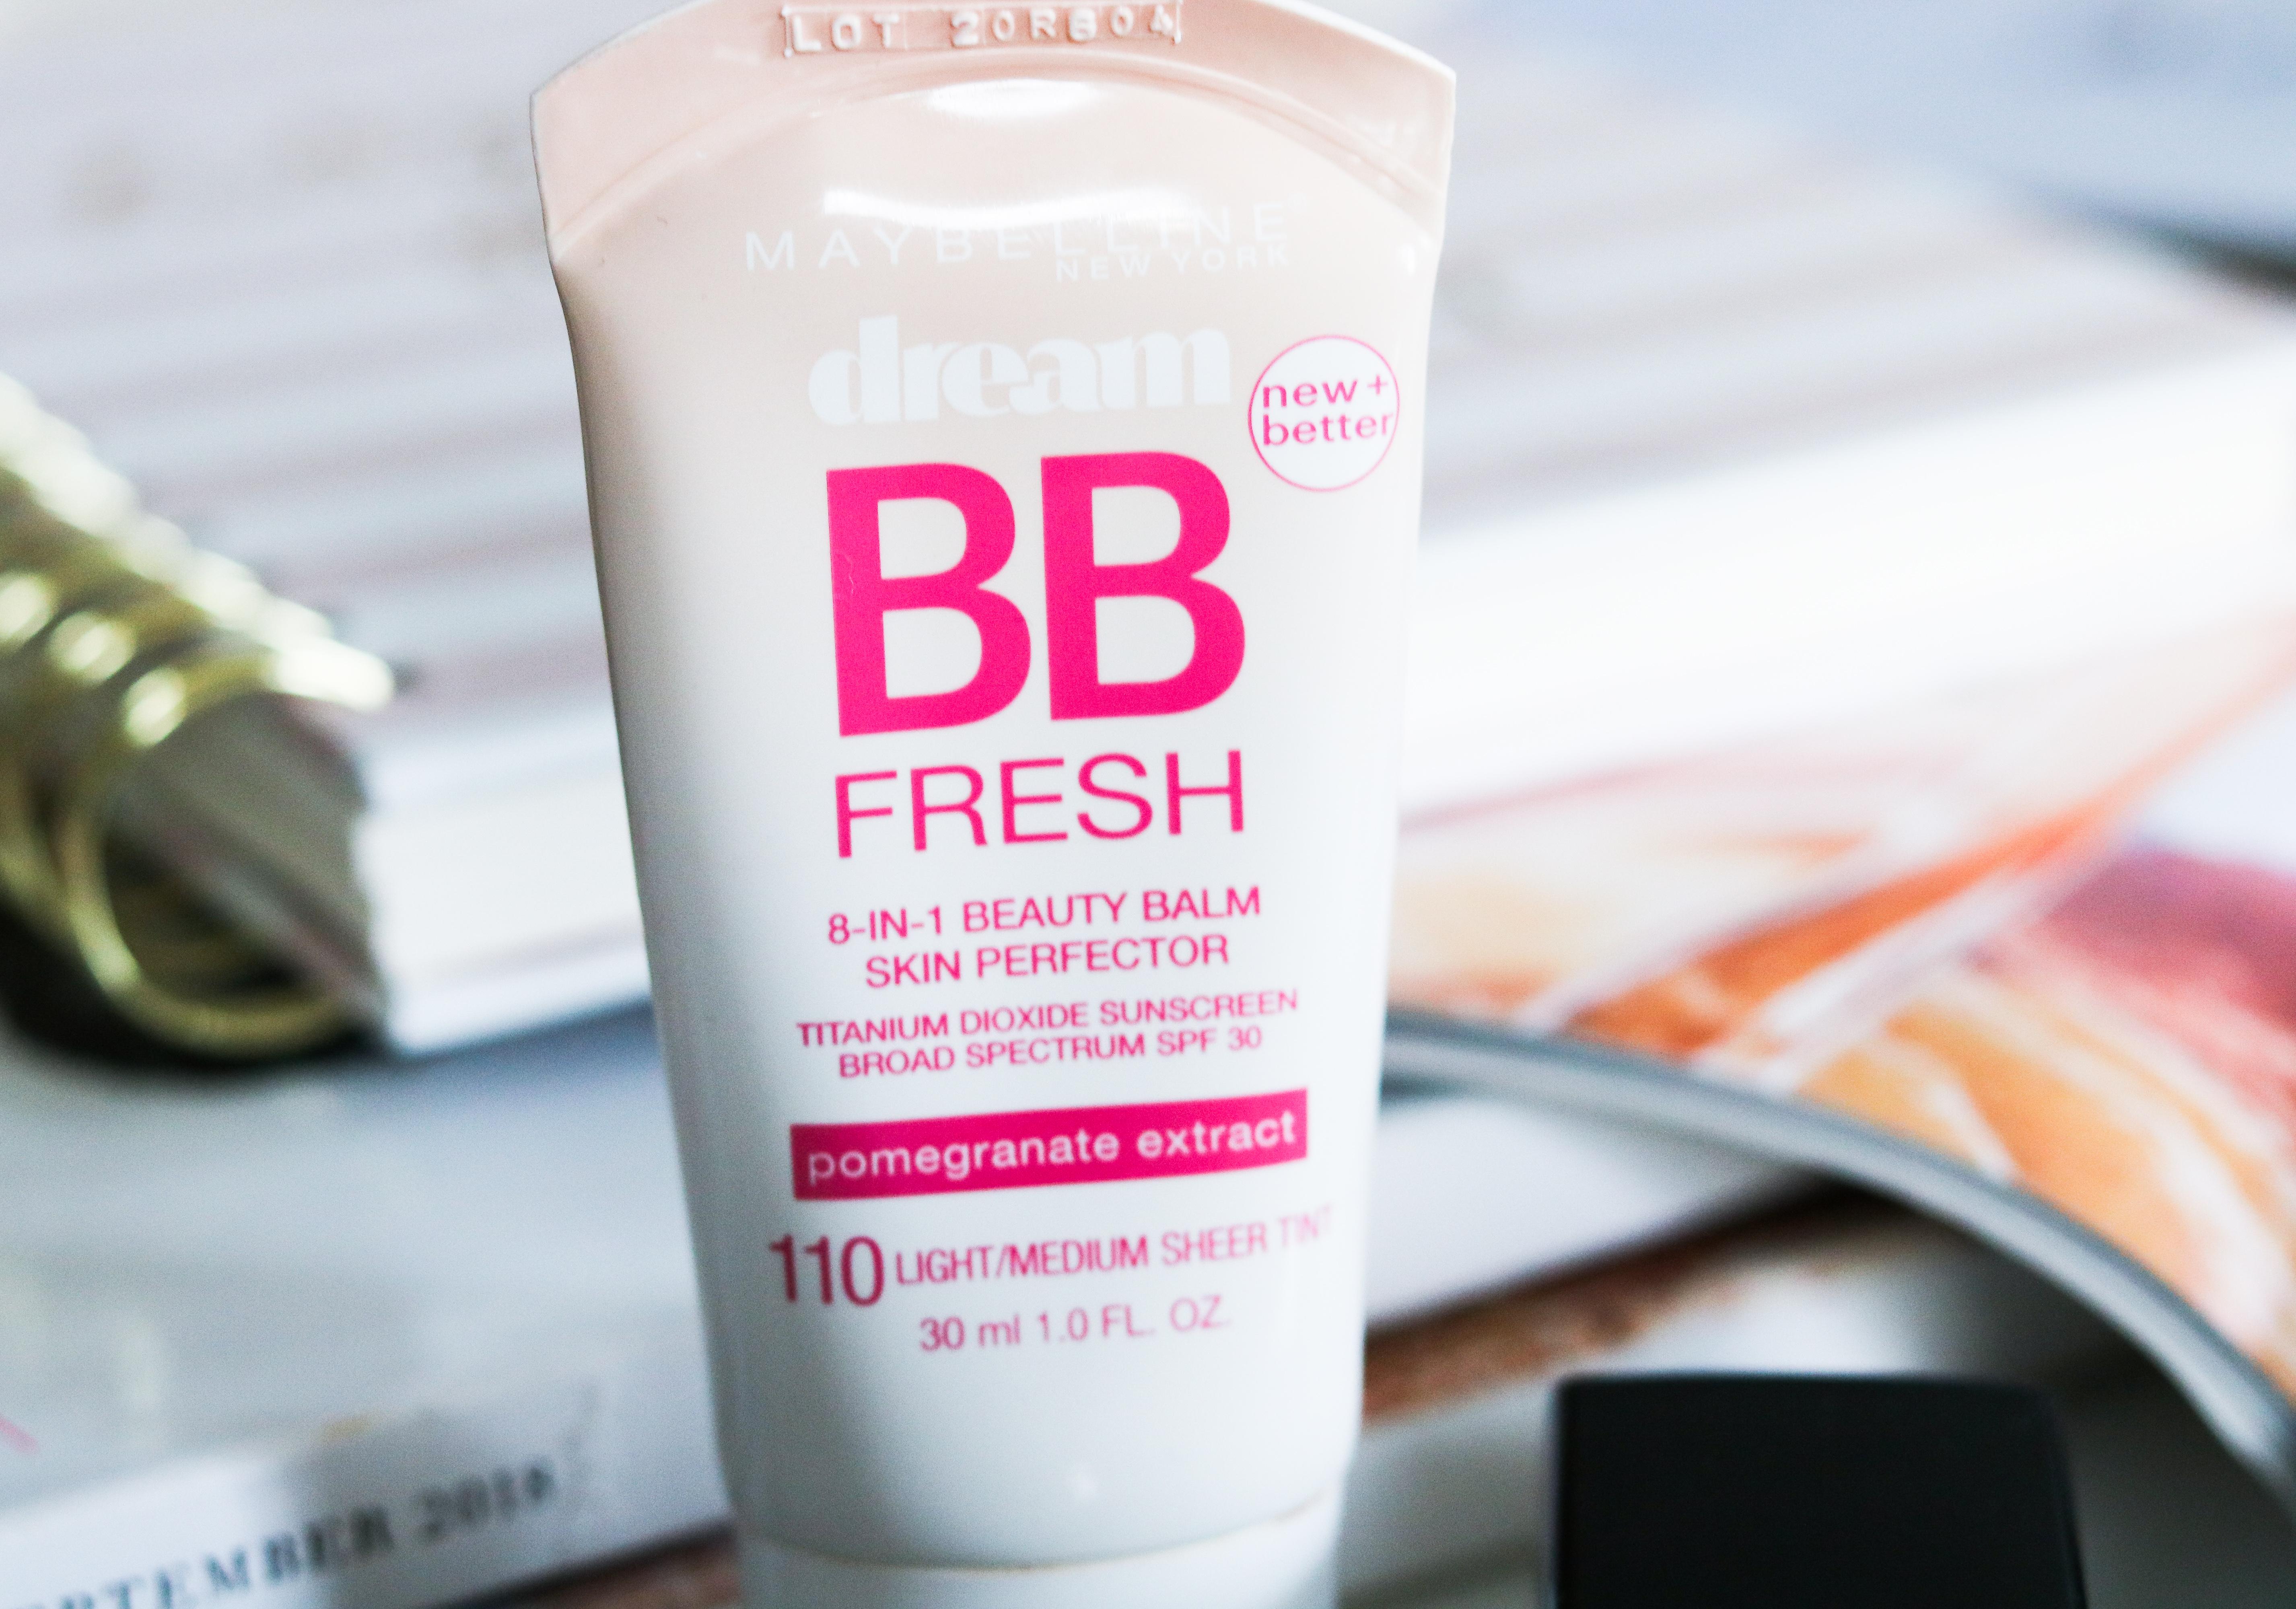 Underrated Makeup Products I Maybelline BB Cream #Makeup #DrugstoreMakeup